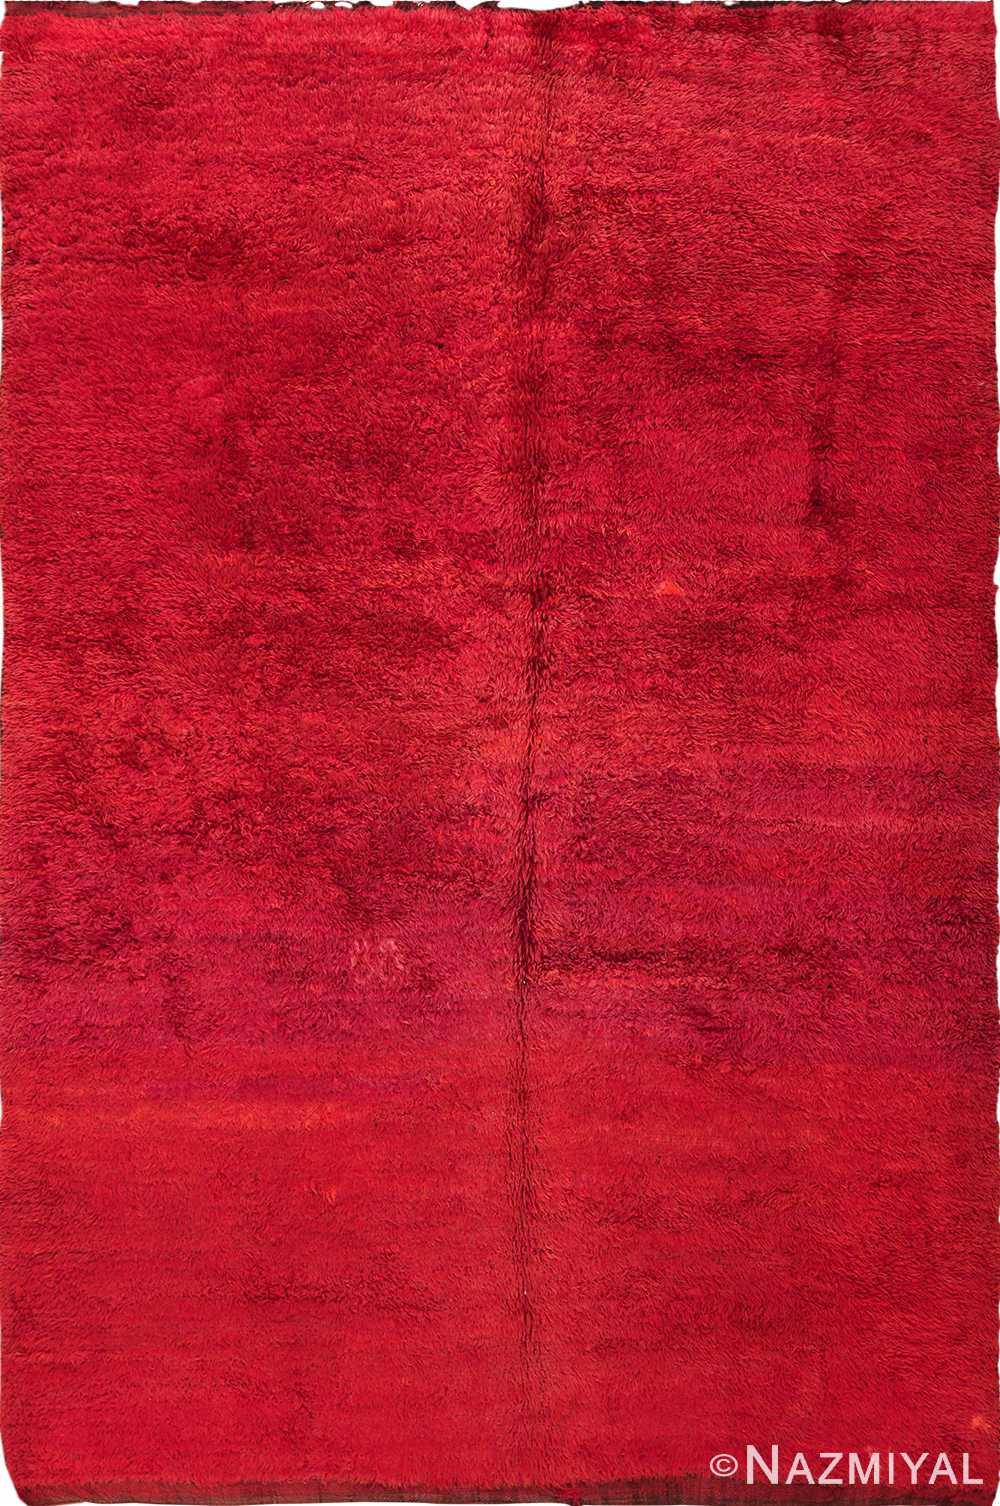 Vintage Moroccan Red Shag Berber Rug 49883 - Nazmiyal